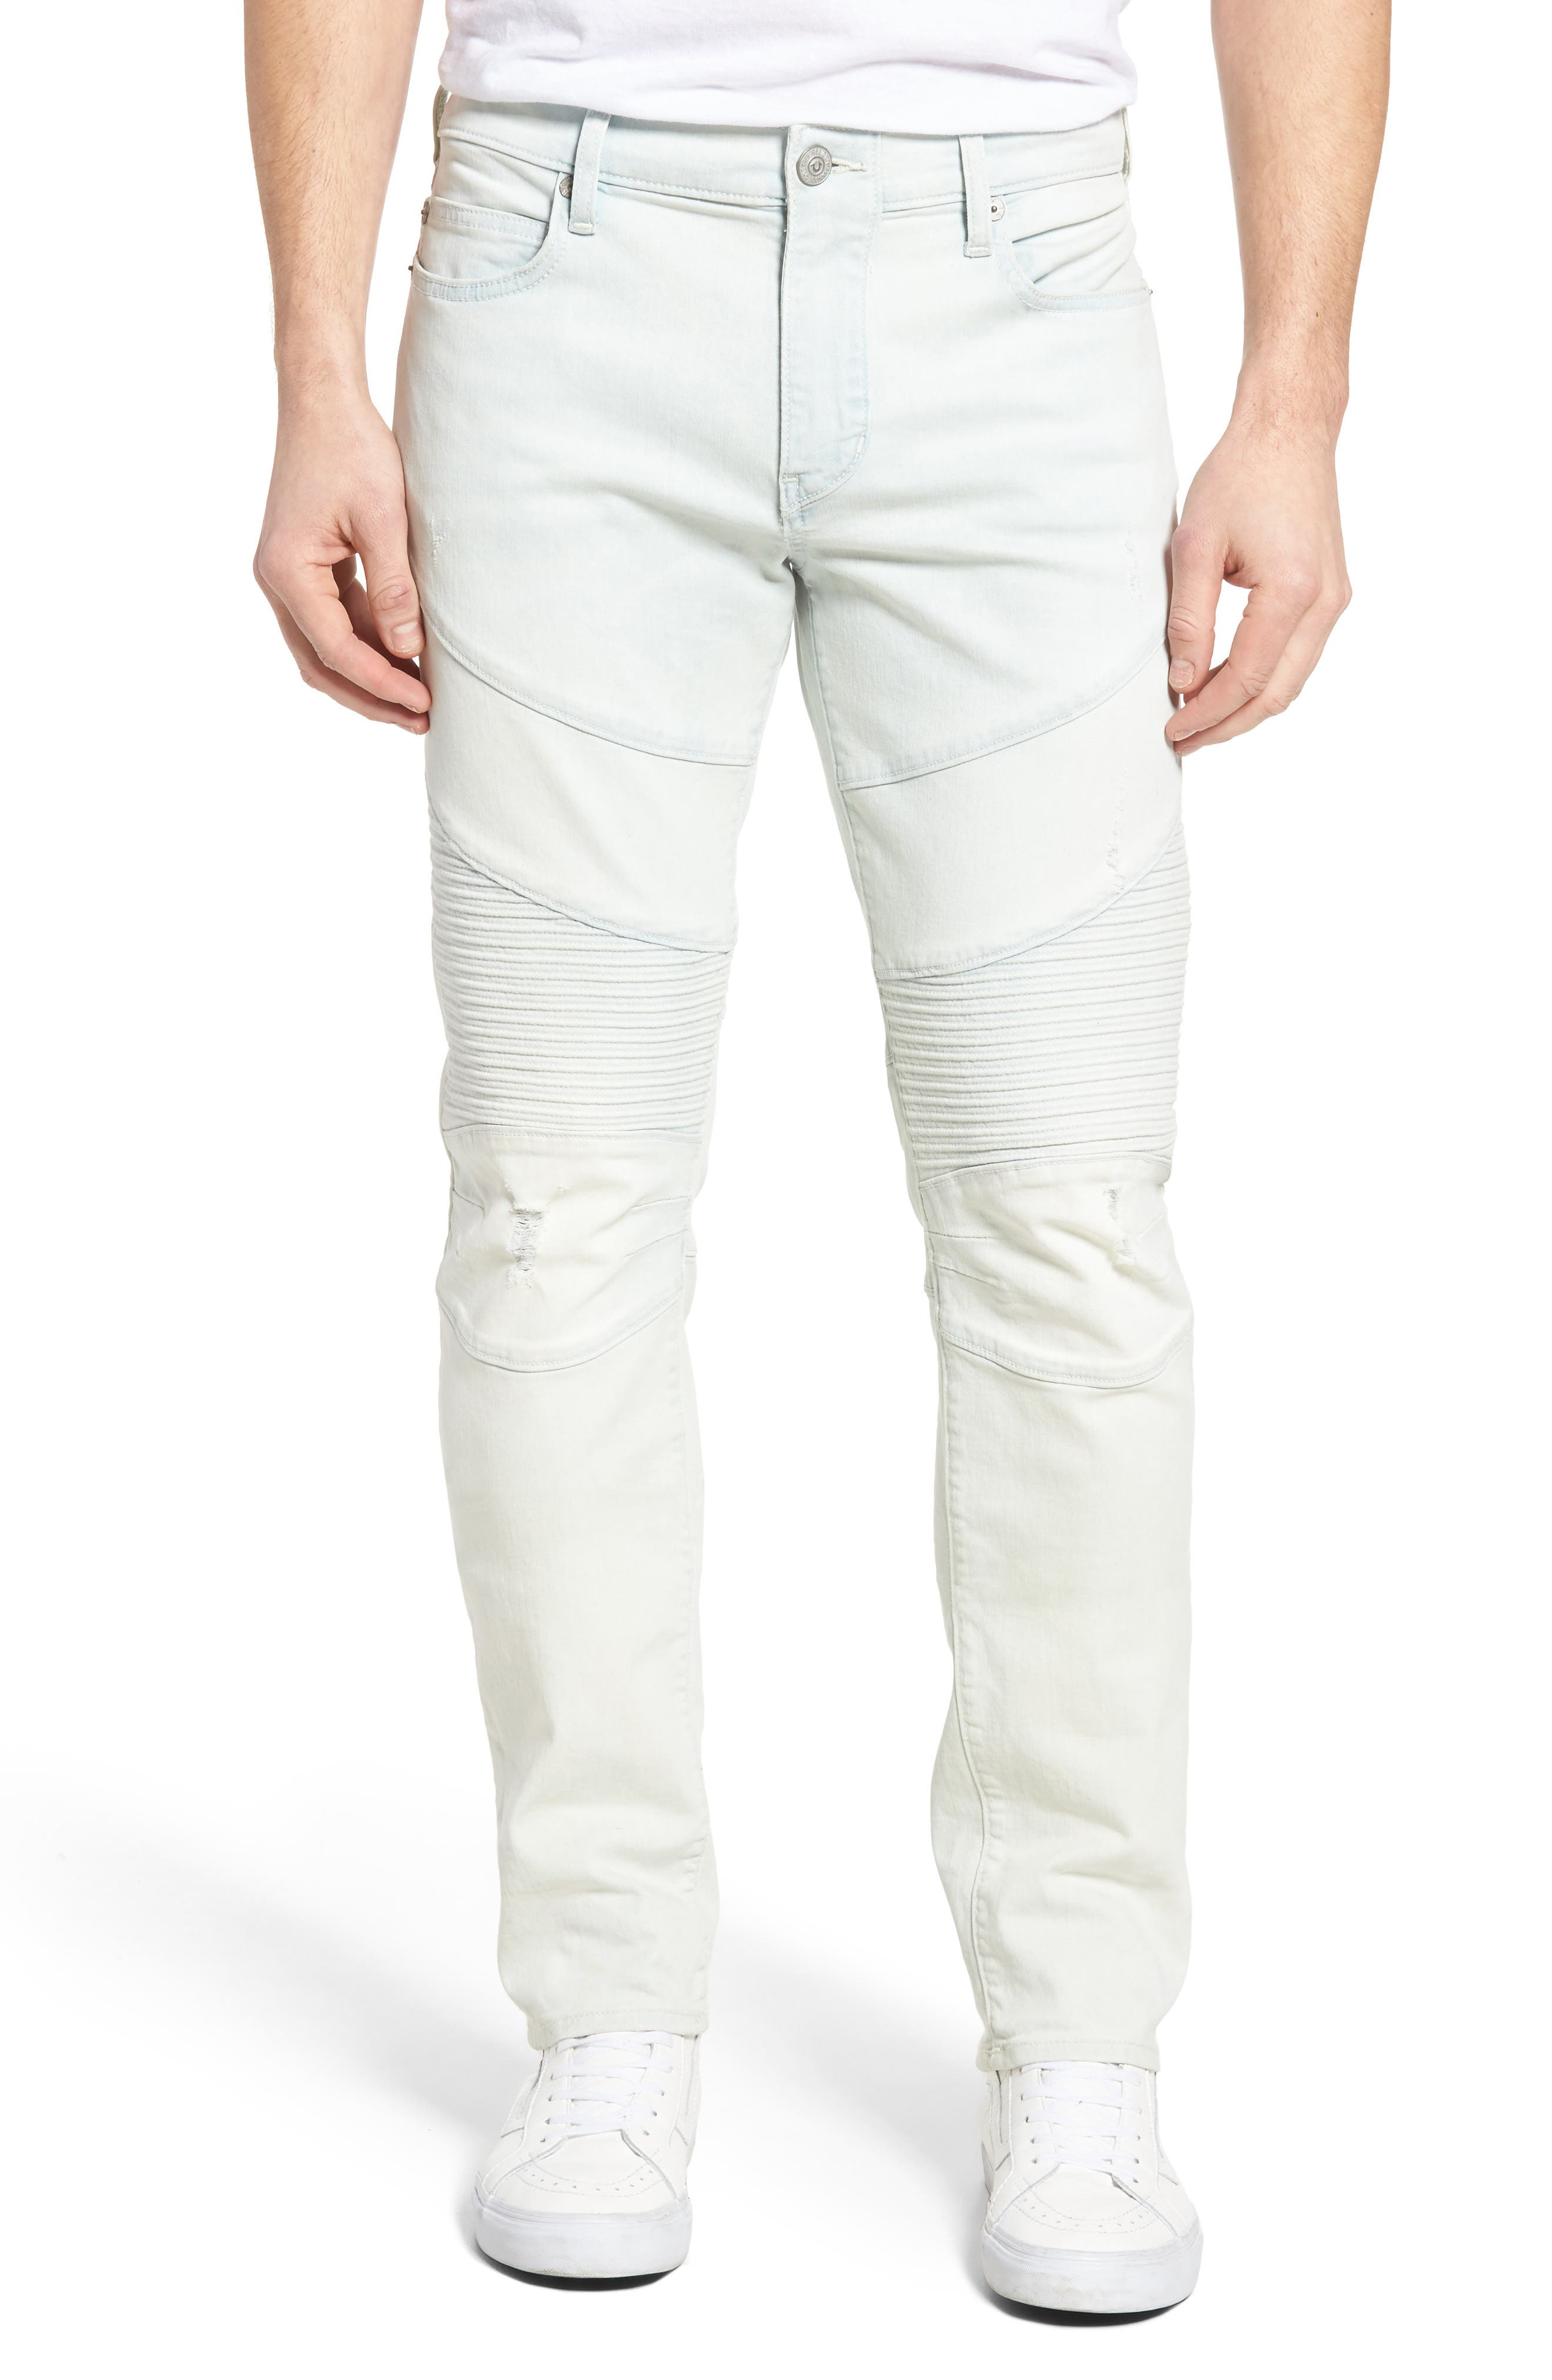 Alternate Image 1 Selected - True Religion Brand Jeans Rocco Skinny Fit Moto Jeans (Light Daze)